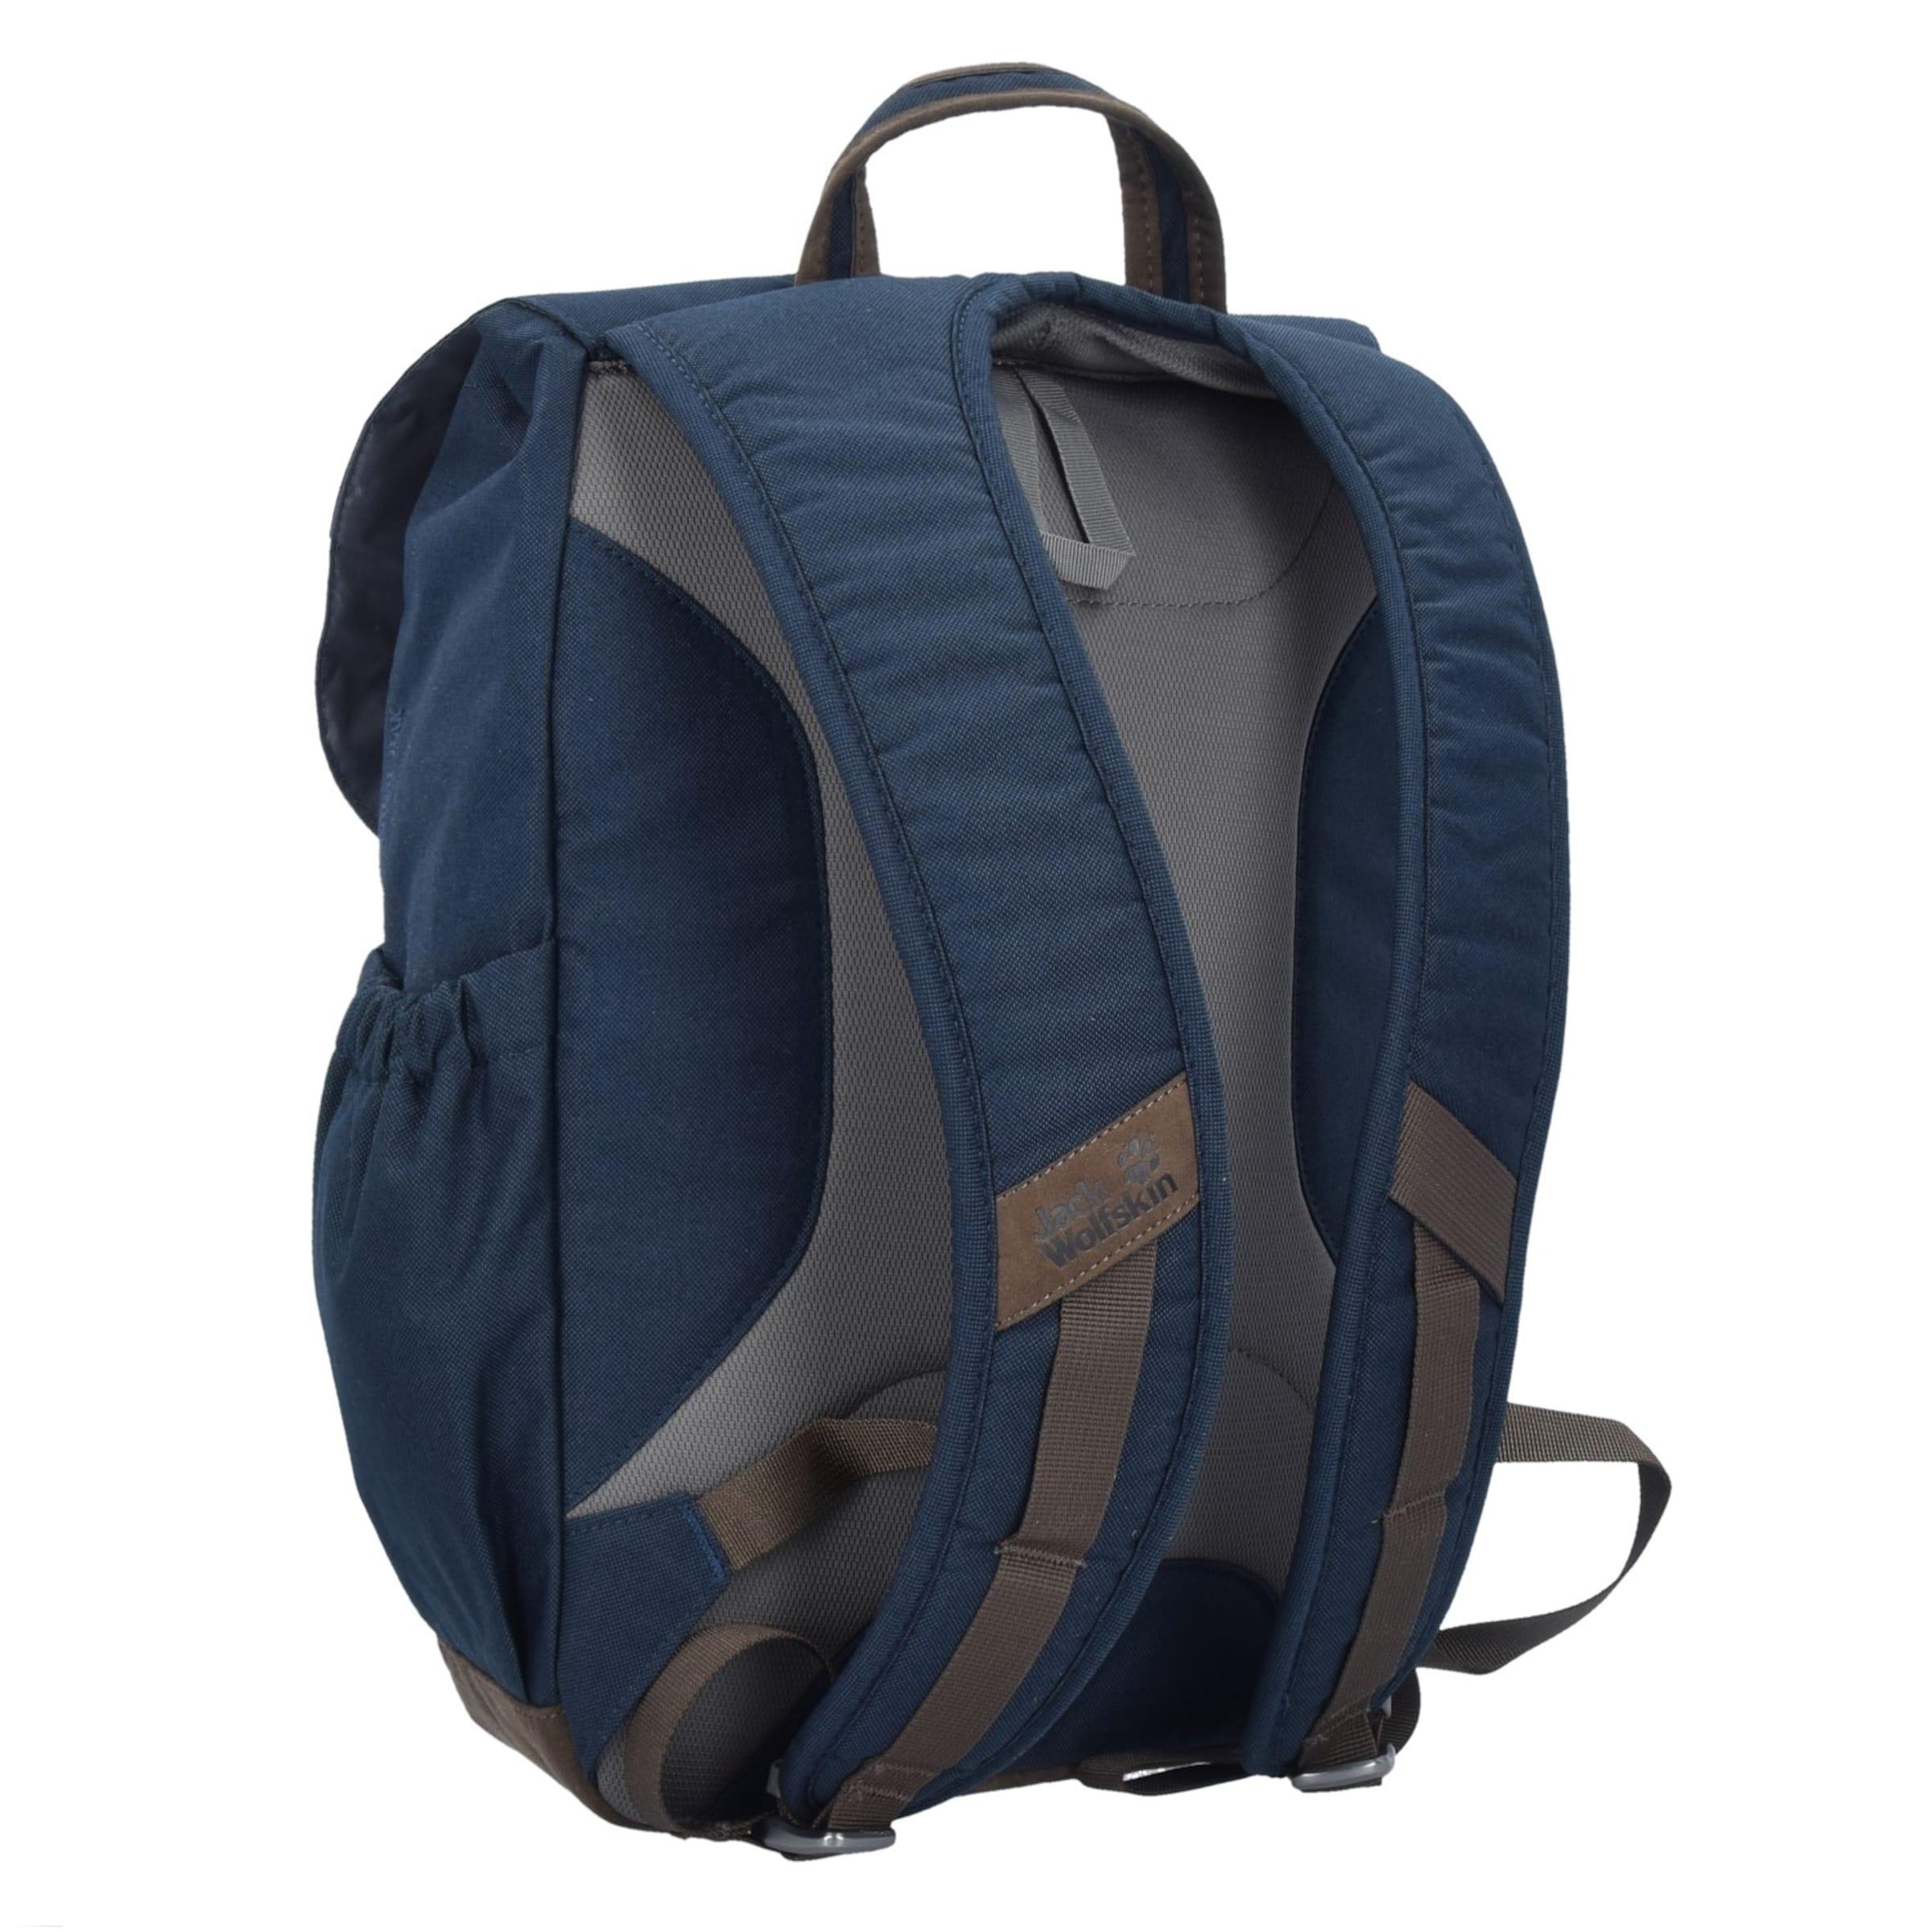 Rucksack 'Daypacks amp; cm Royal 42 Oak' Bags WOLFSKIN JACK 5YUHq65